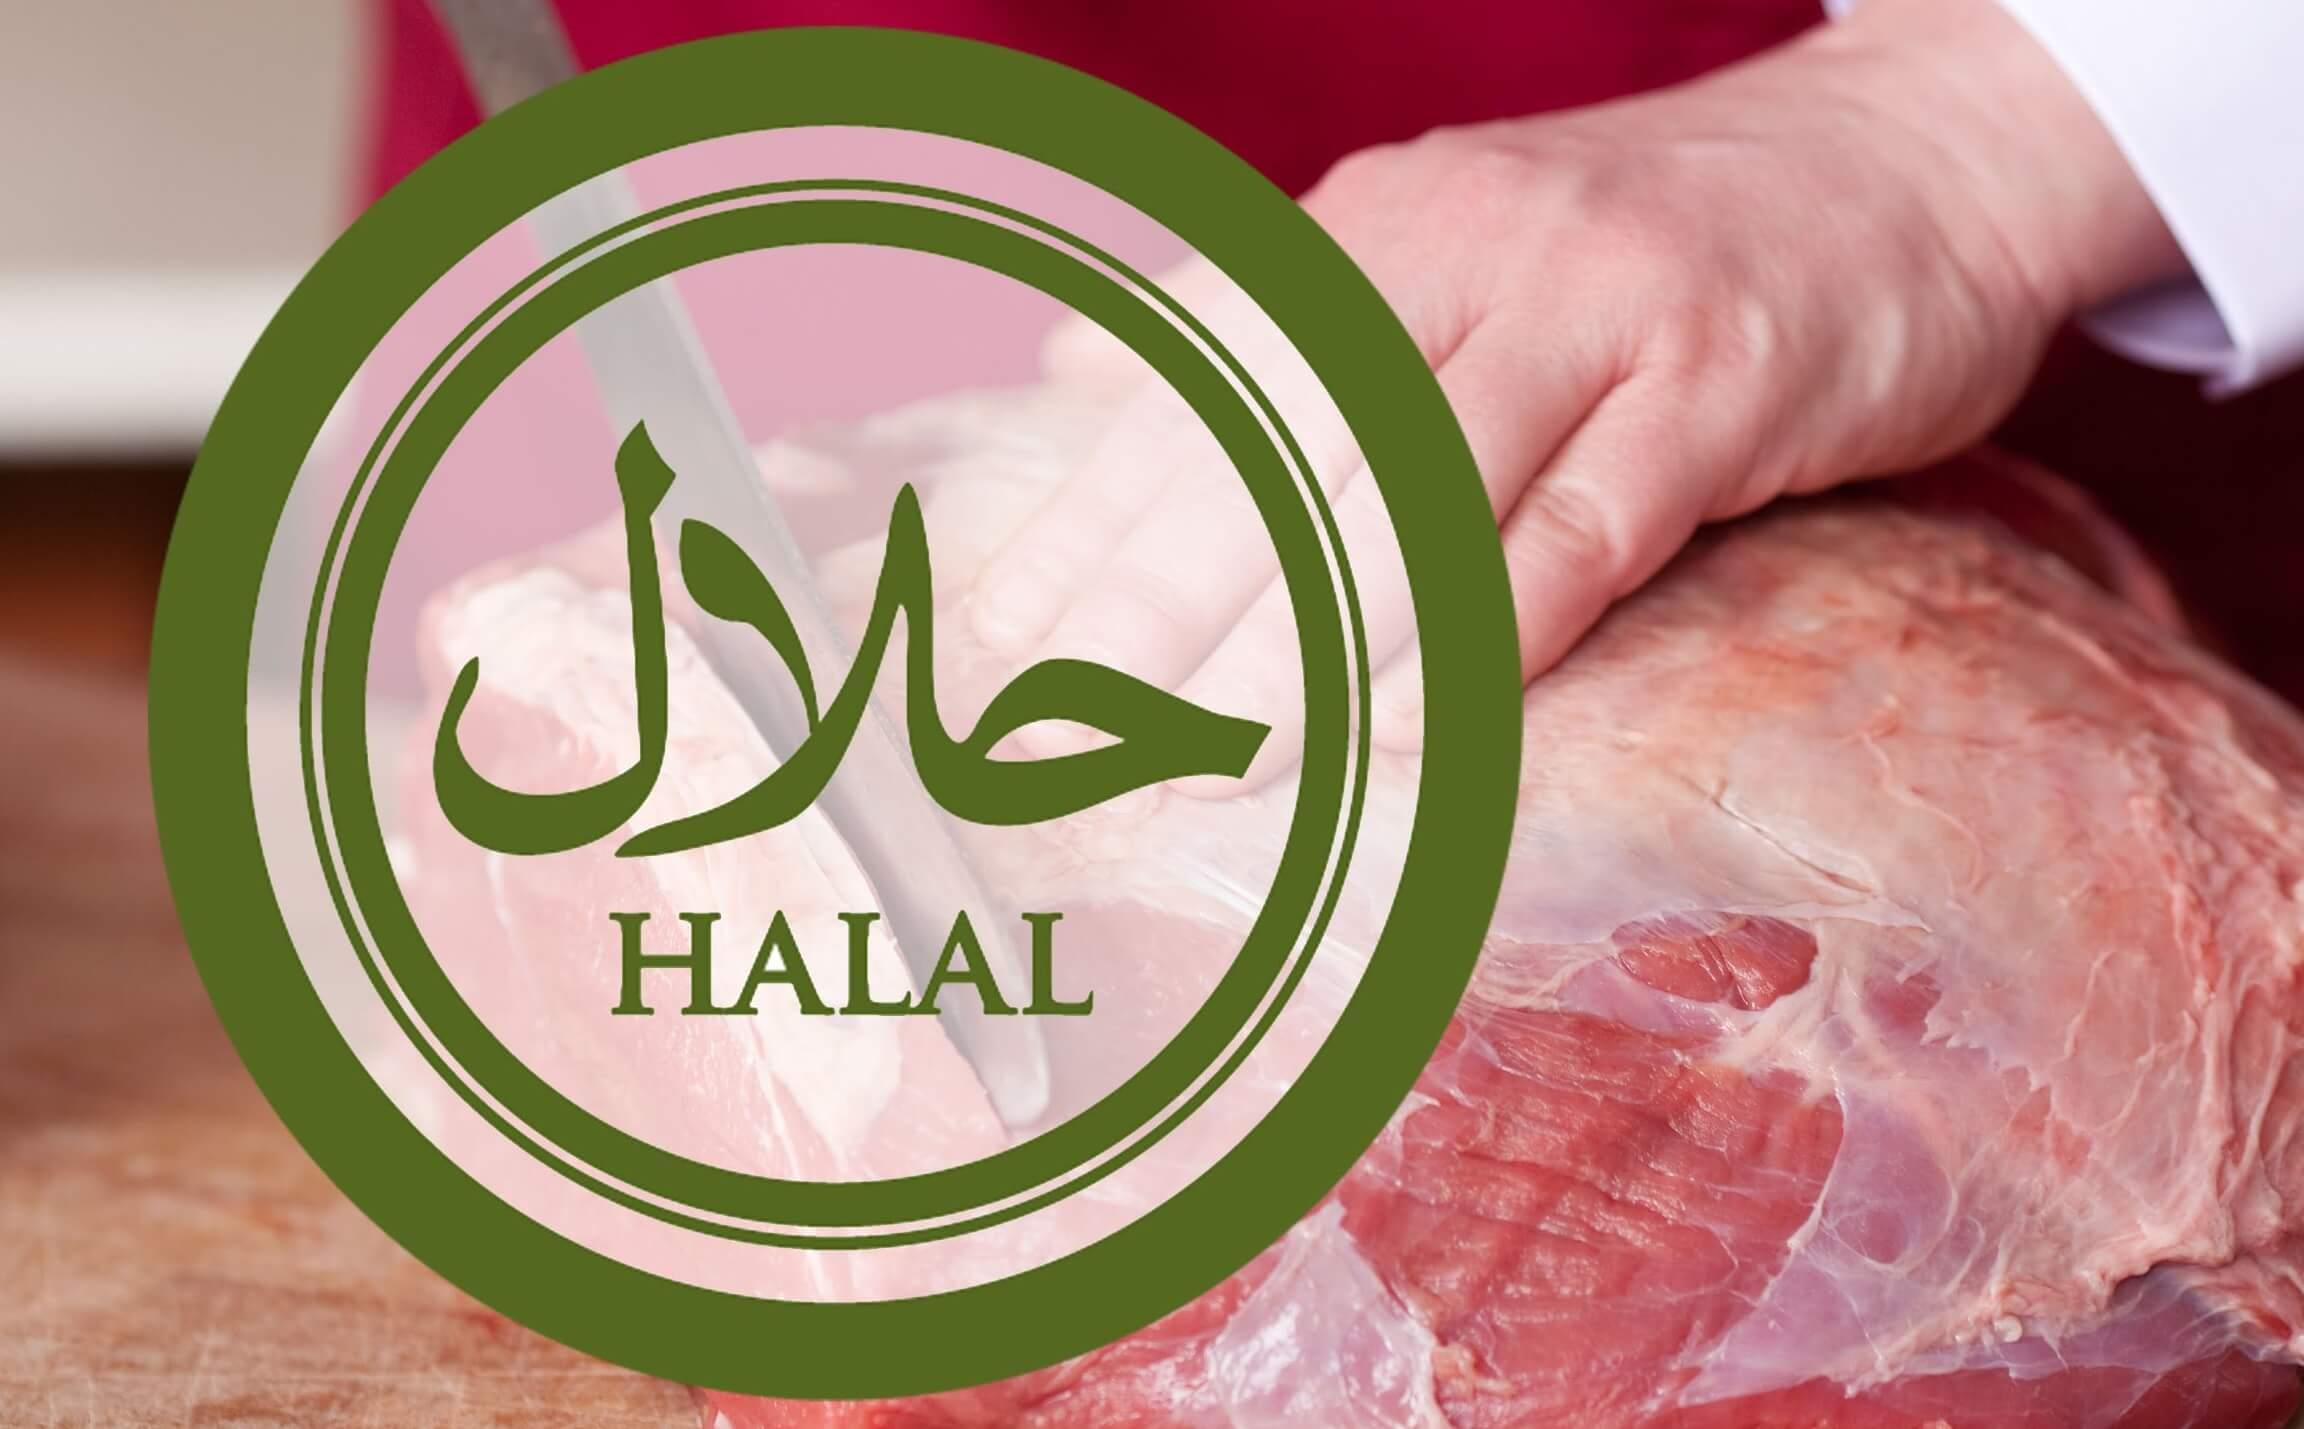 abate halal